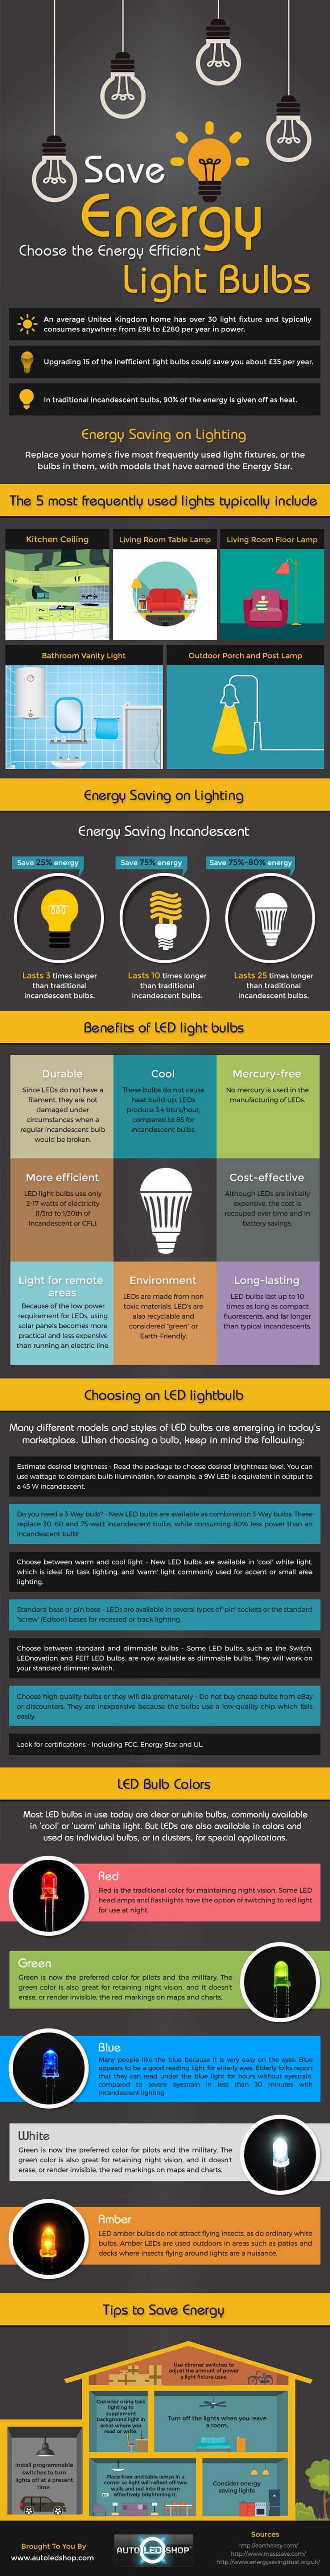 choosing energy efficient bulbs